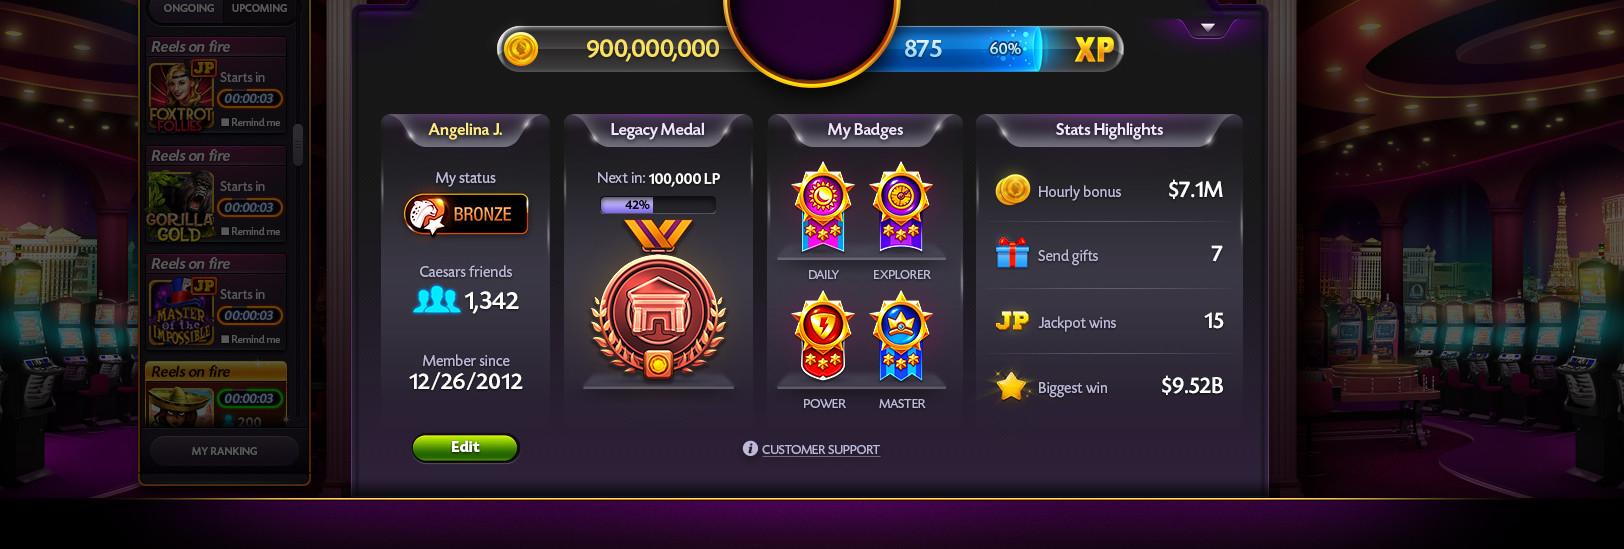 Yaron granot medals 4b